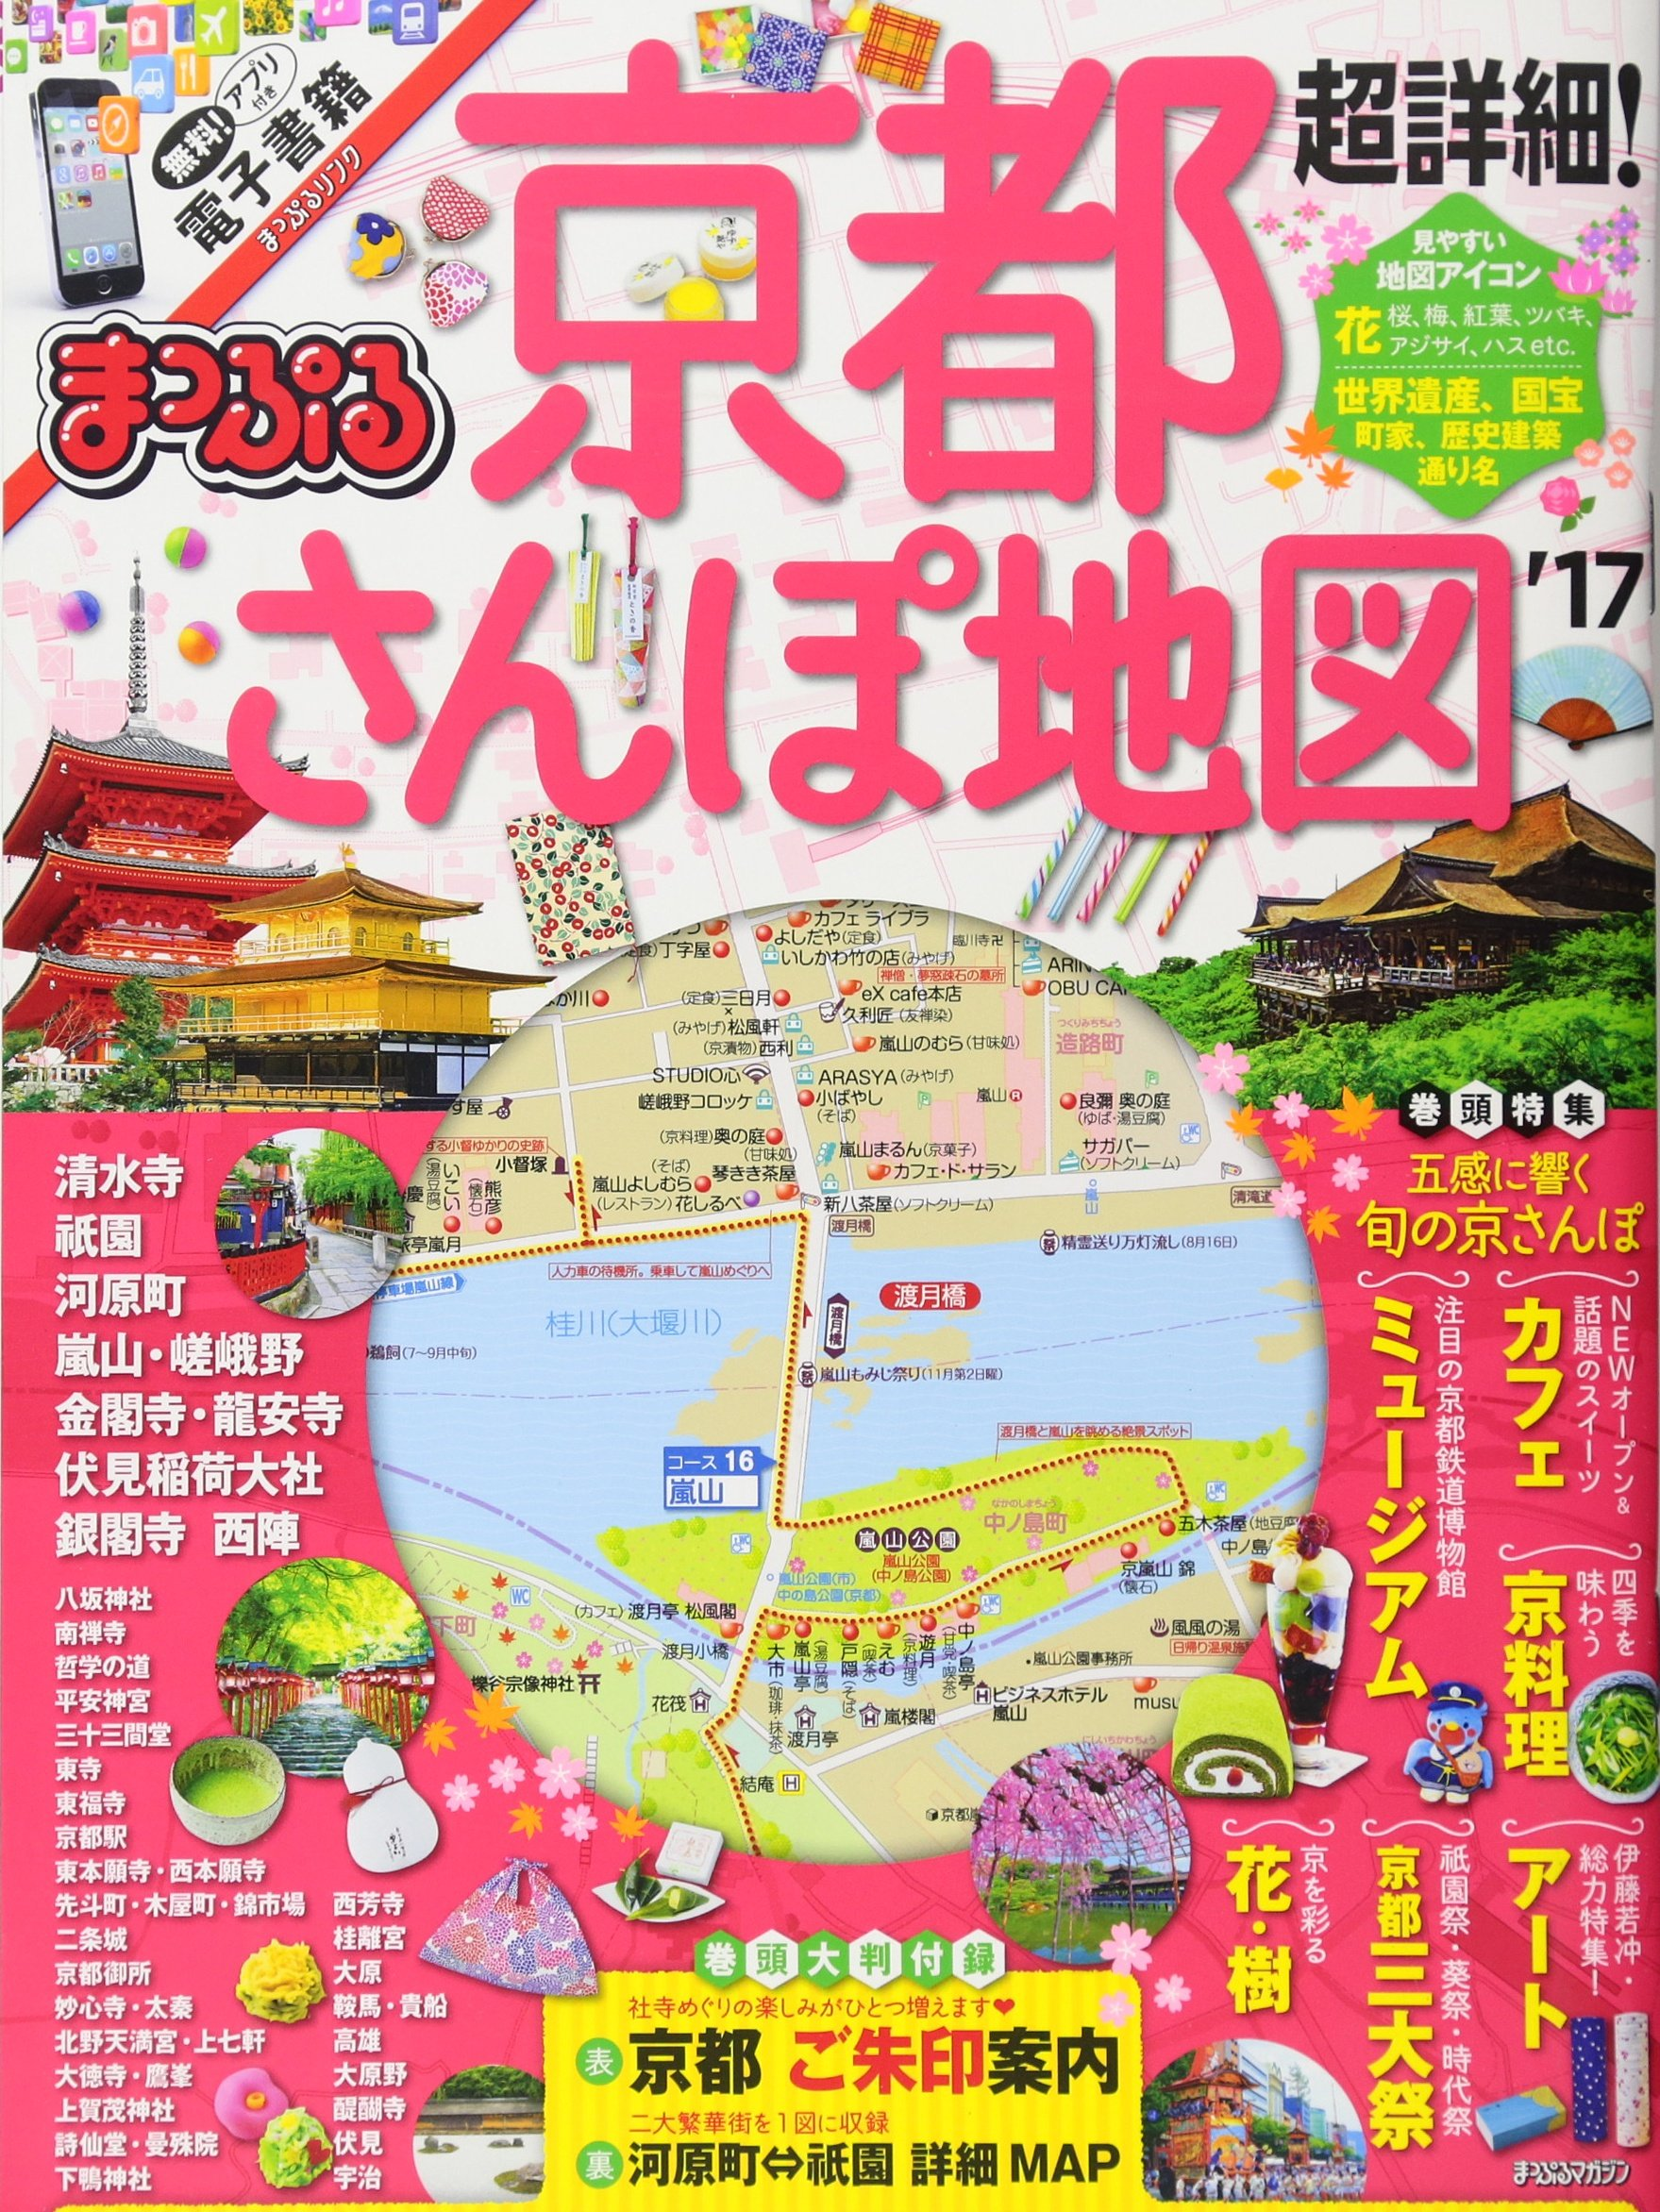 Tangled puru-details! Kyoto map ' 17 (chomping action magazine) pdf epub